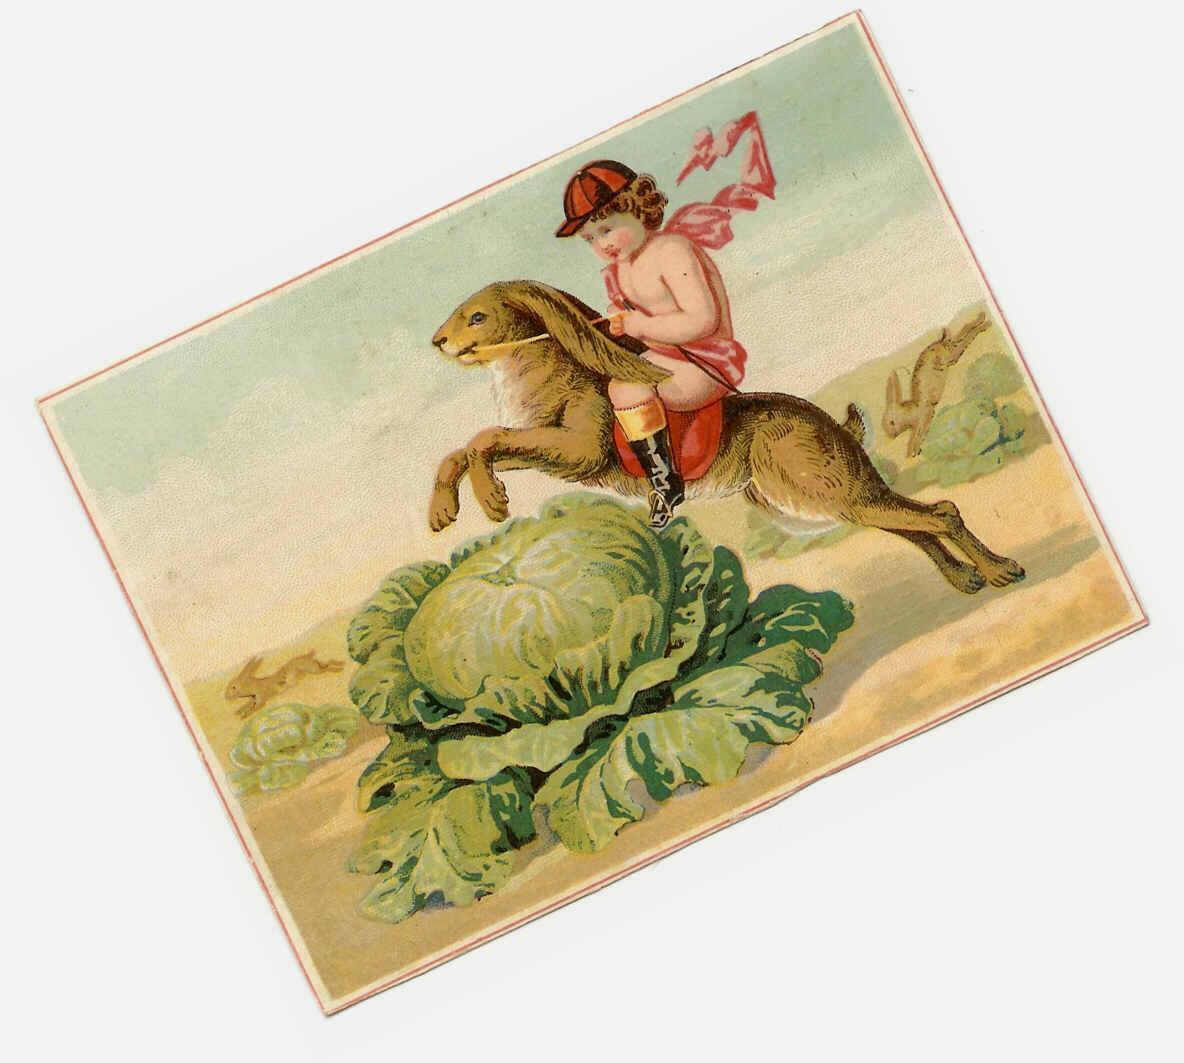 VICTORIAN Trade Card for the Great London Tea Company, Boston, Mass.!